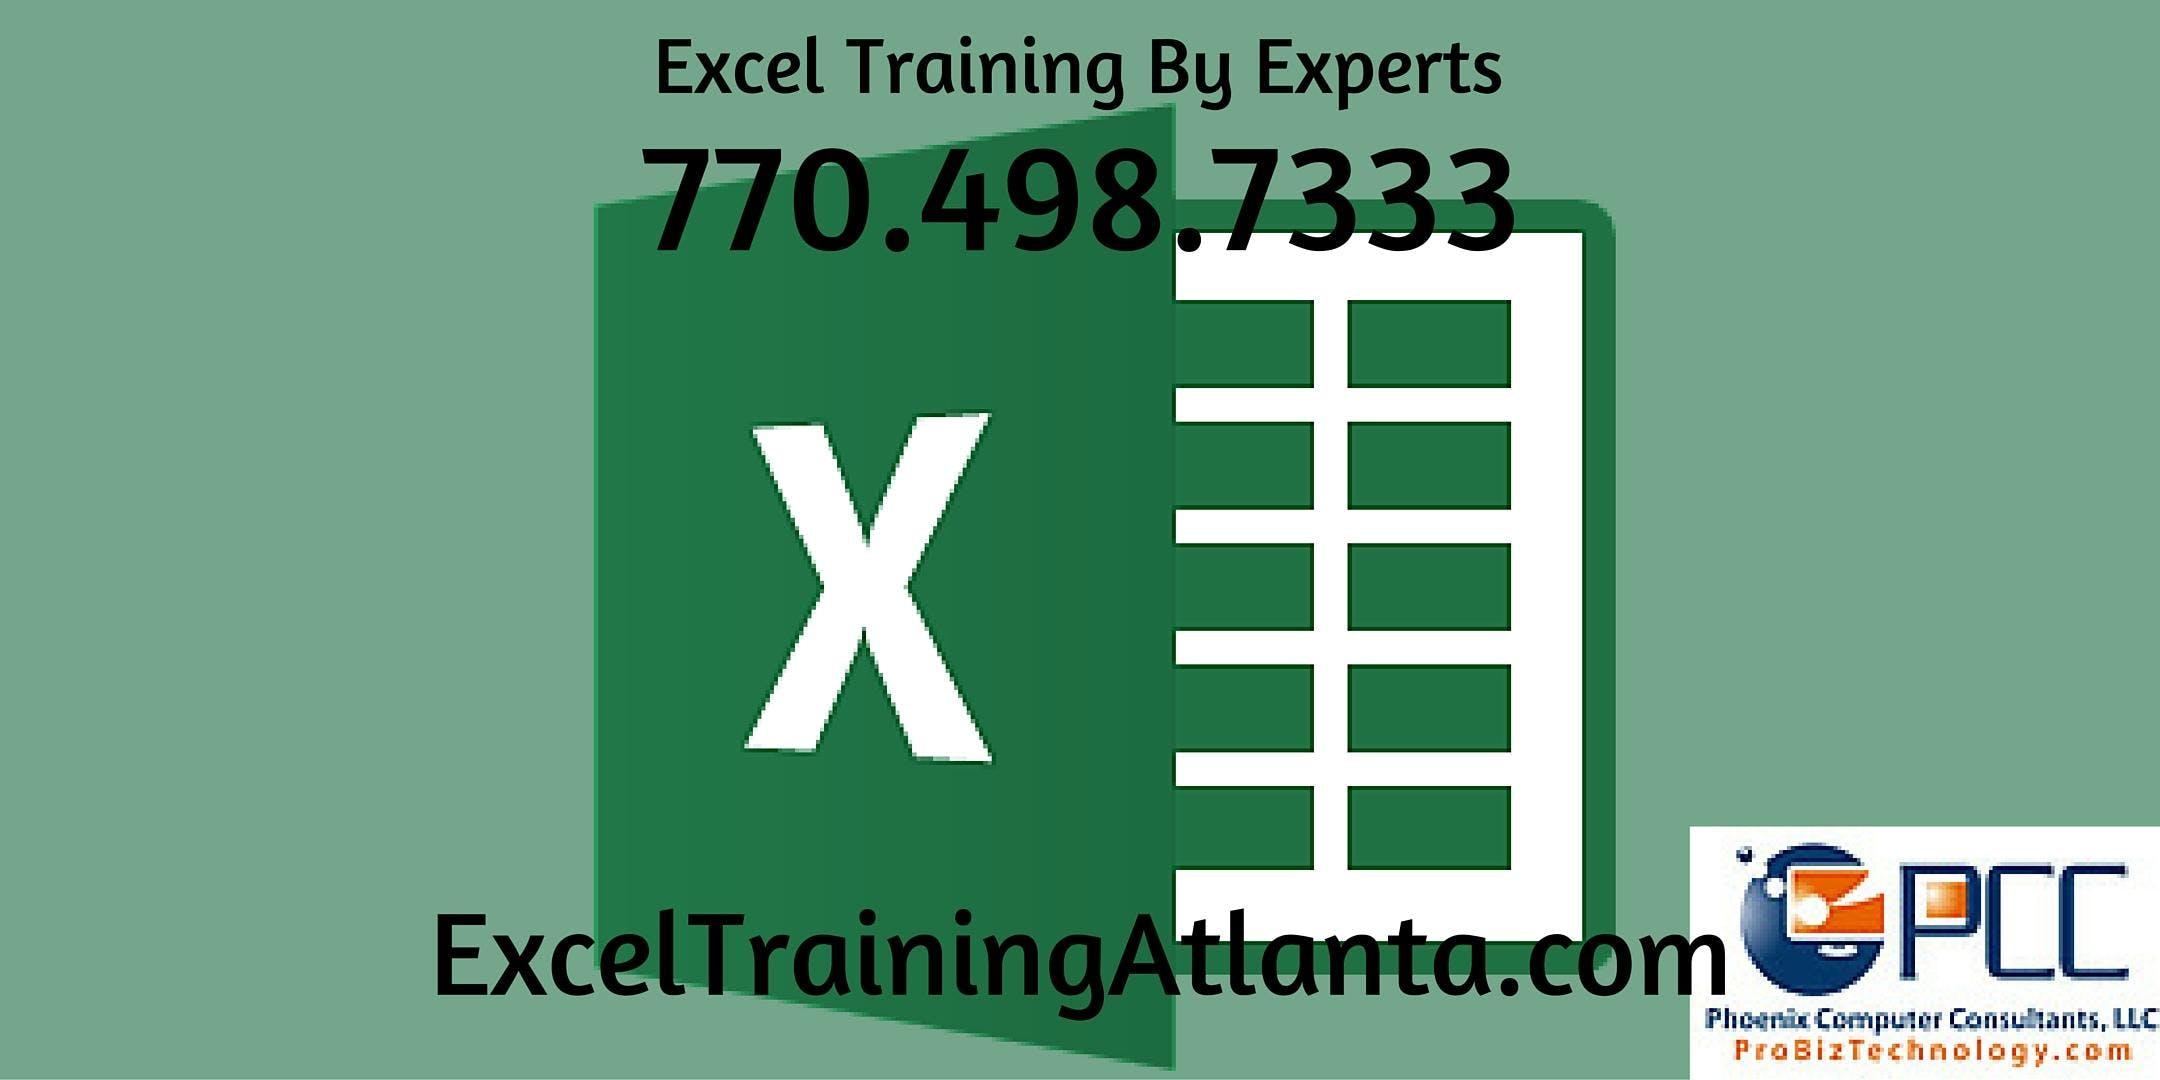 Excel 2013 Comprehensive Course - MCAS Certification Prep (Aug 2018)